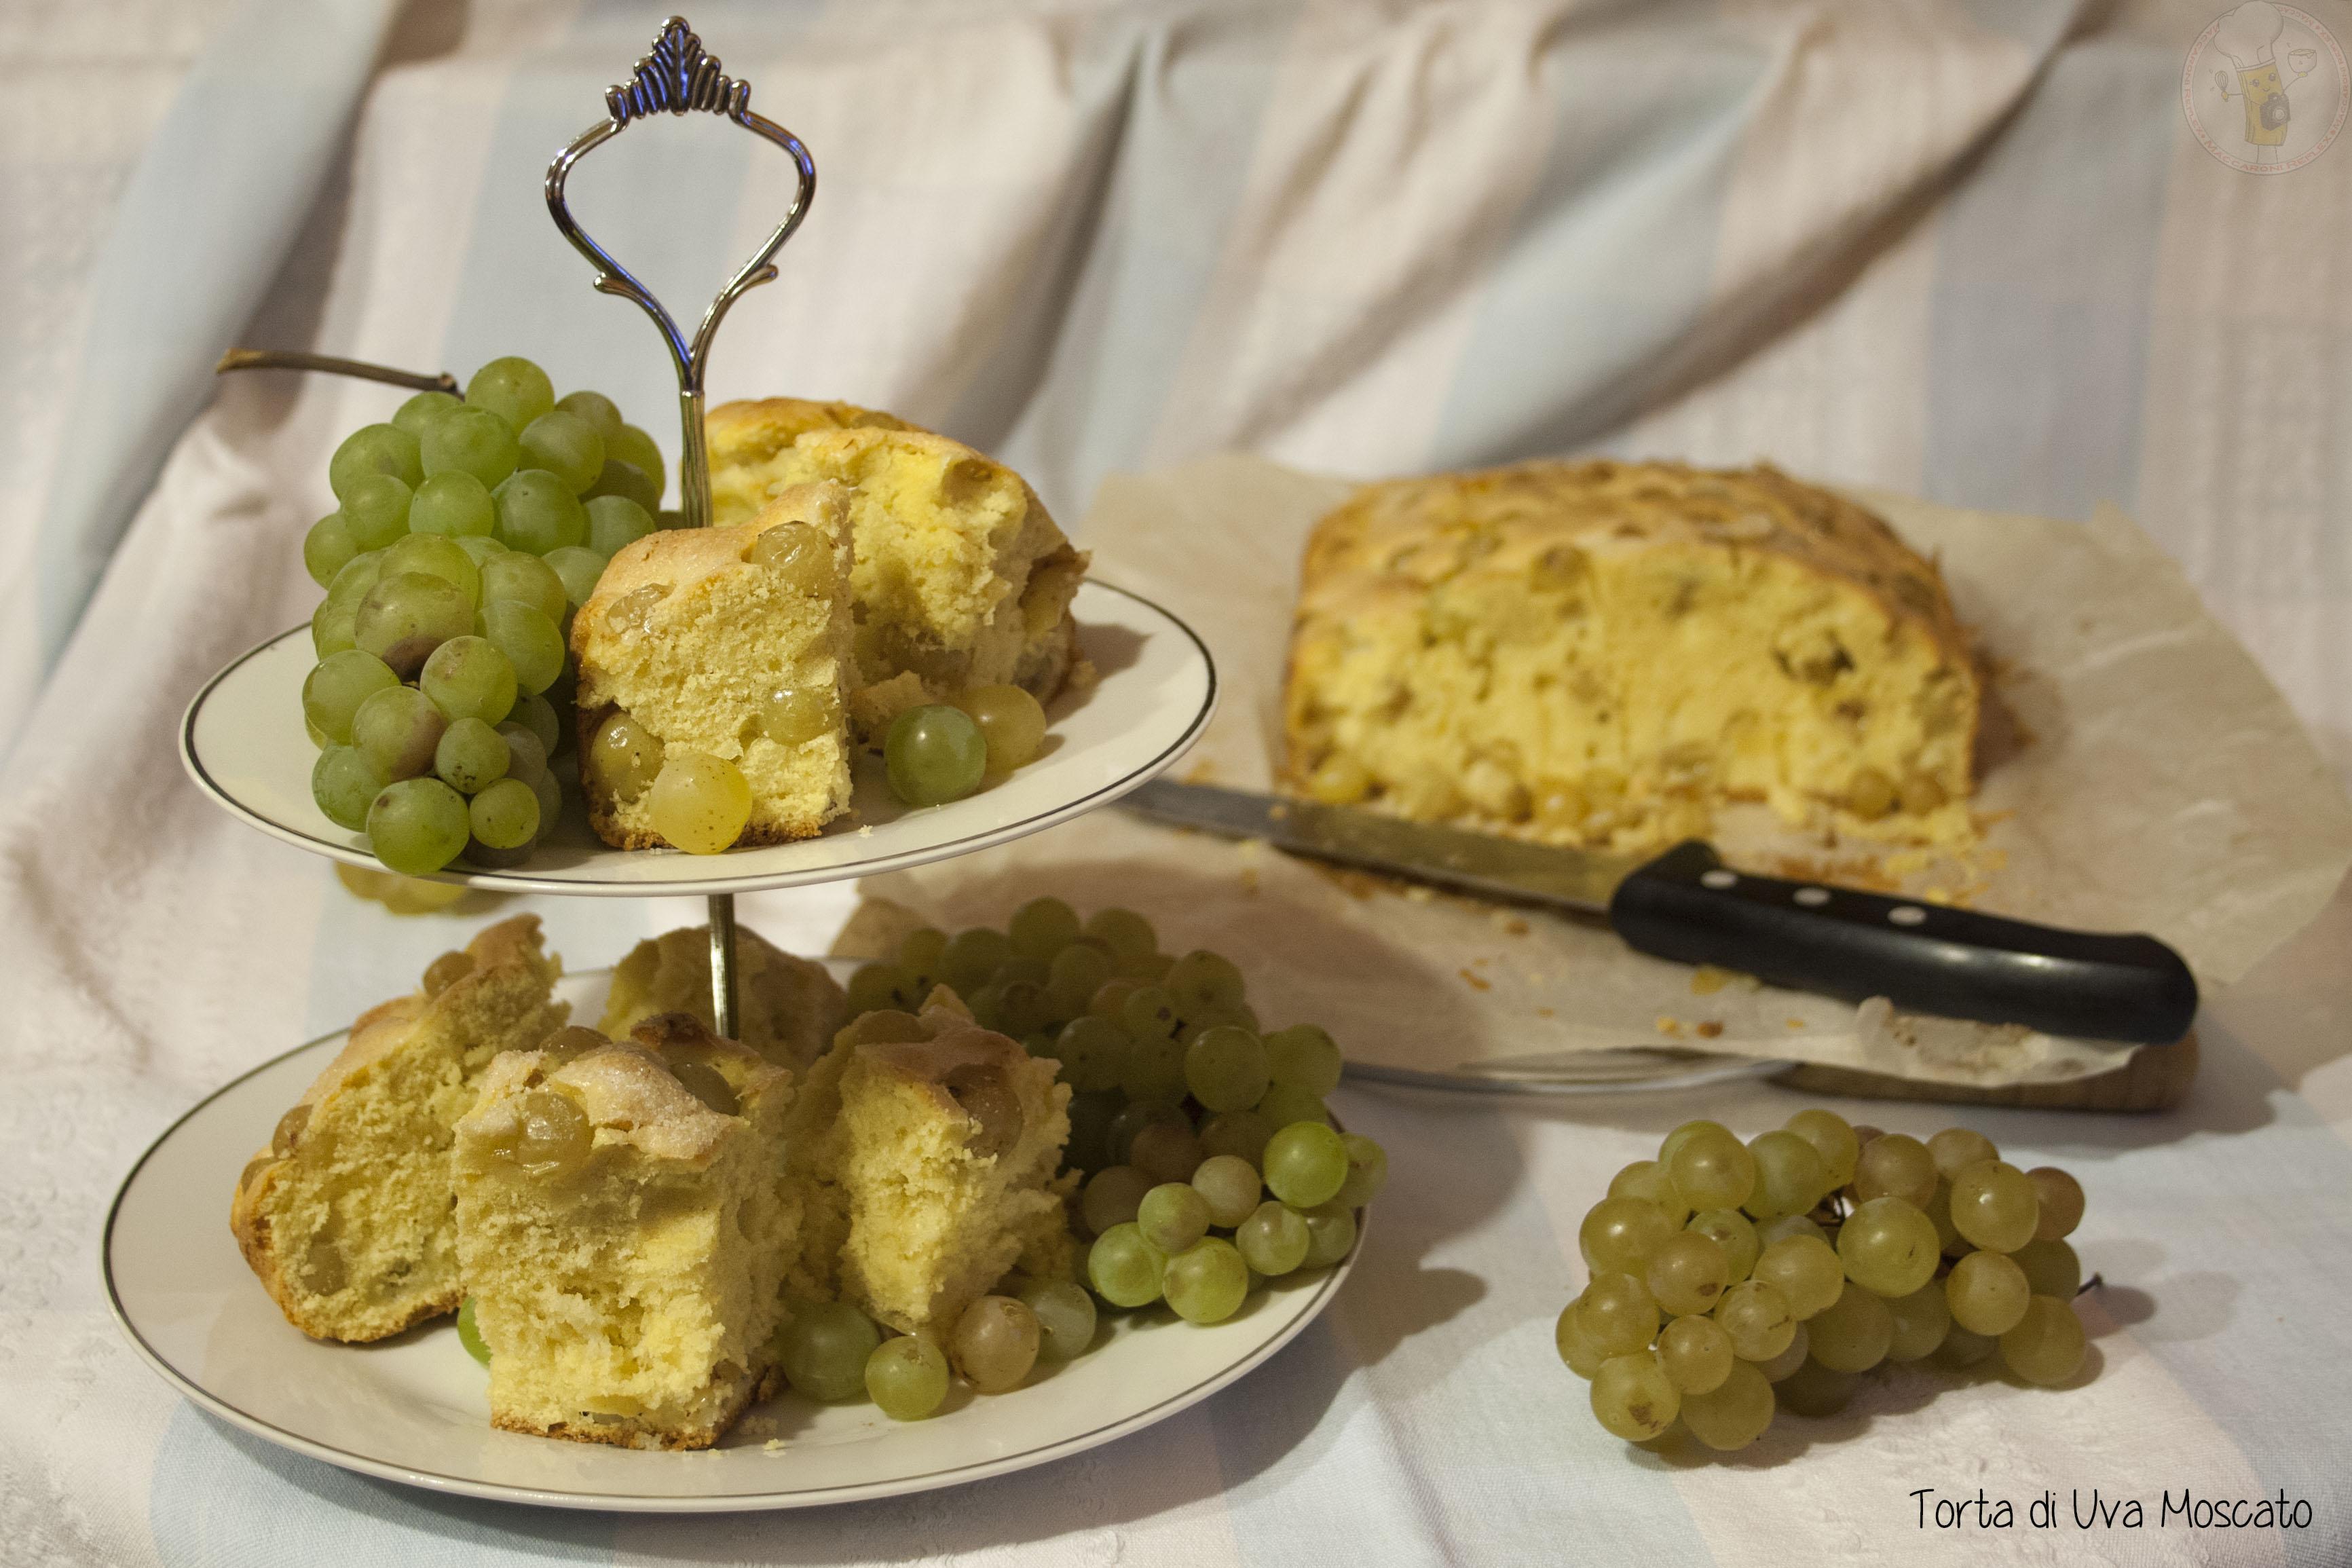 Torta di uva Moscato e una gita ai vigneti di Ricaldone